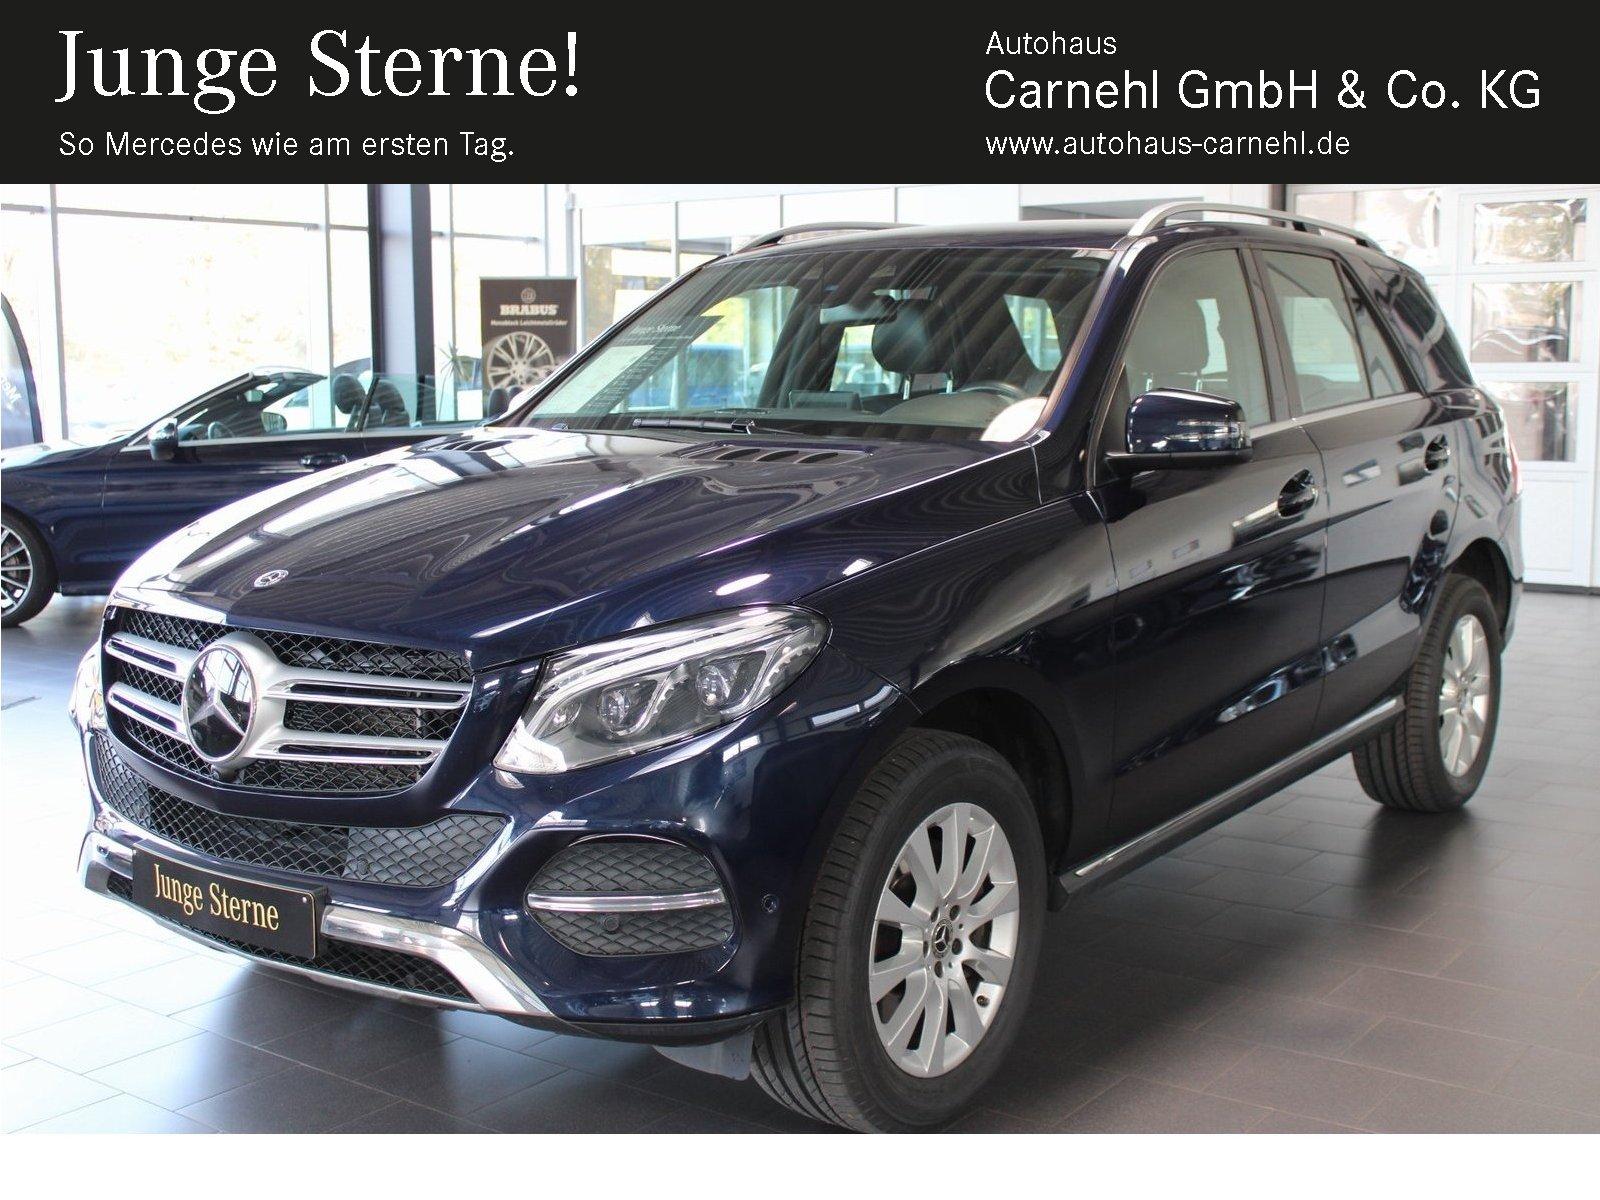 Mercedes-Benz GLE 400 4M AMG+Distronic+Memory+360°Cam+Comand, Jahr 2018, Benzin